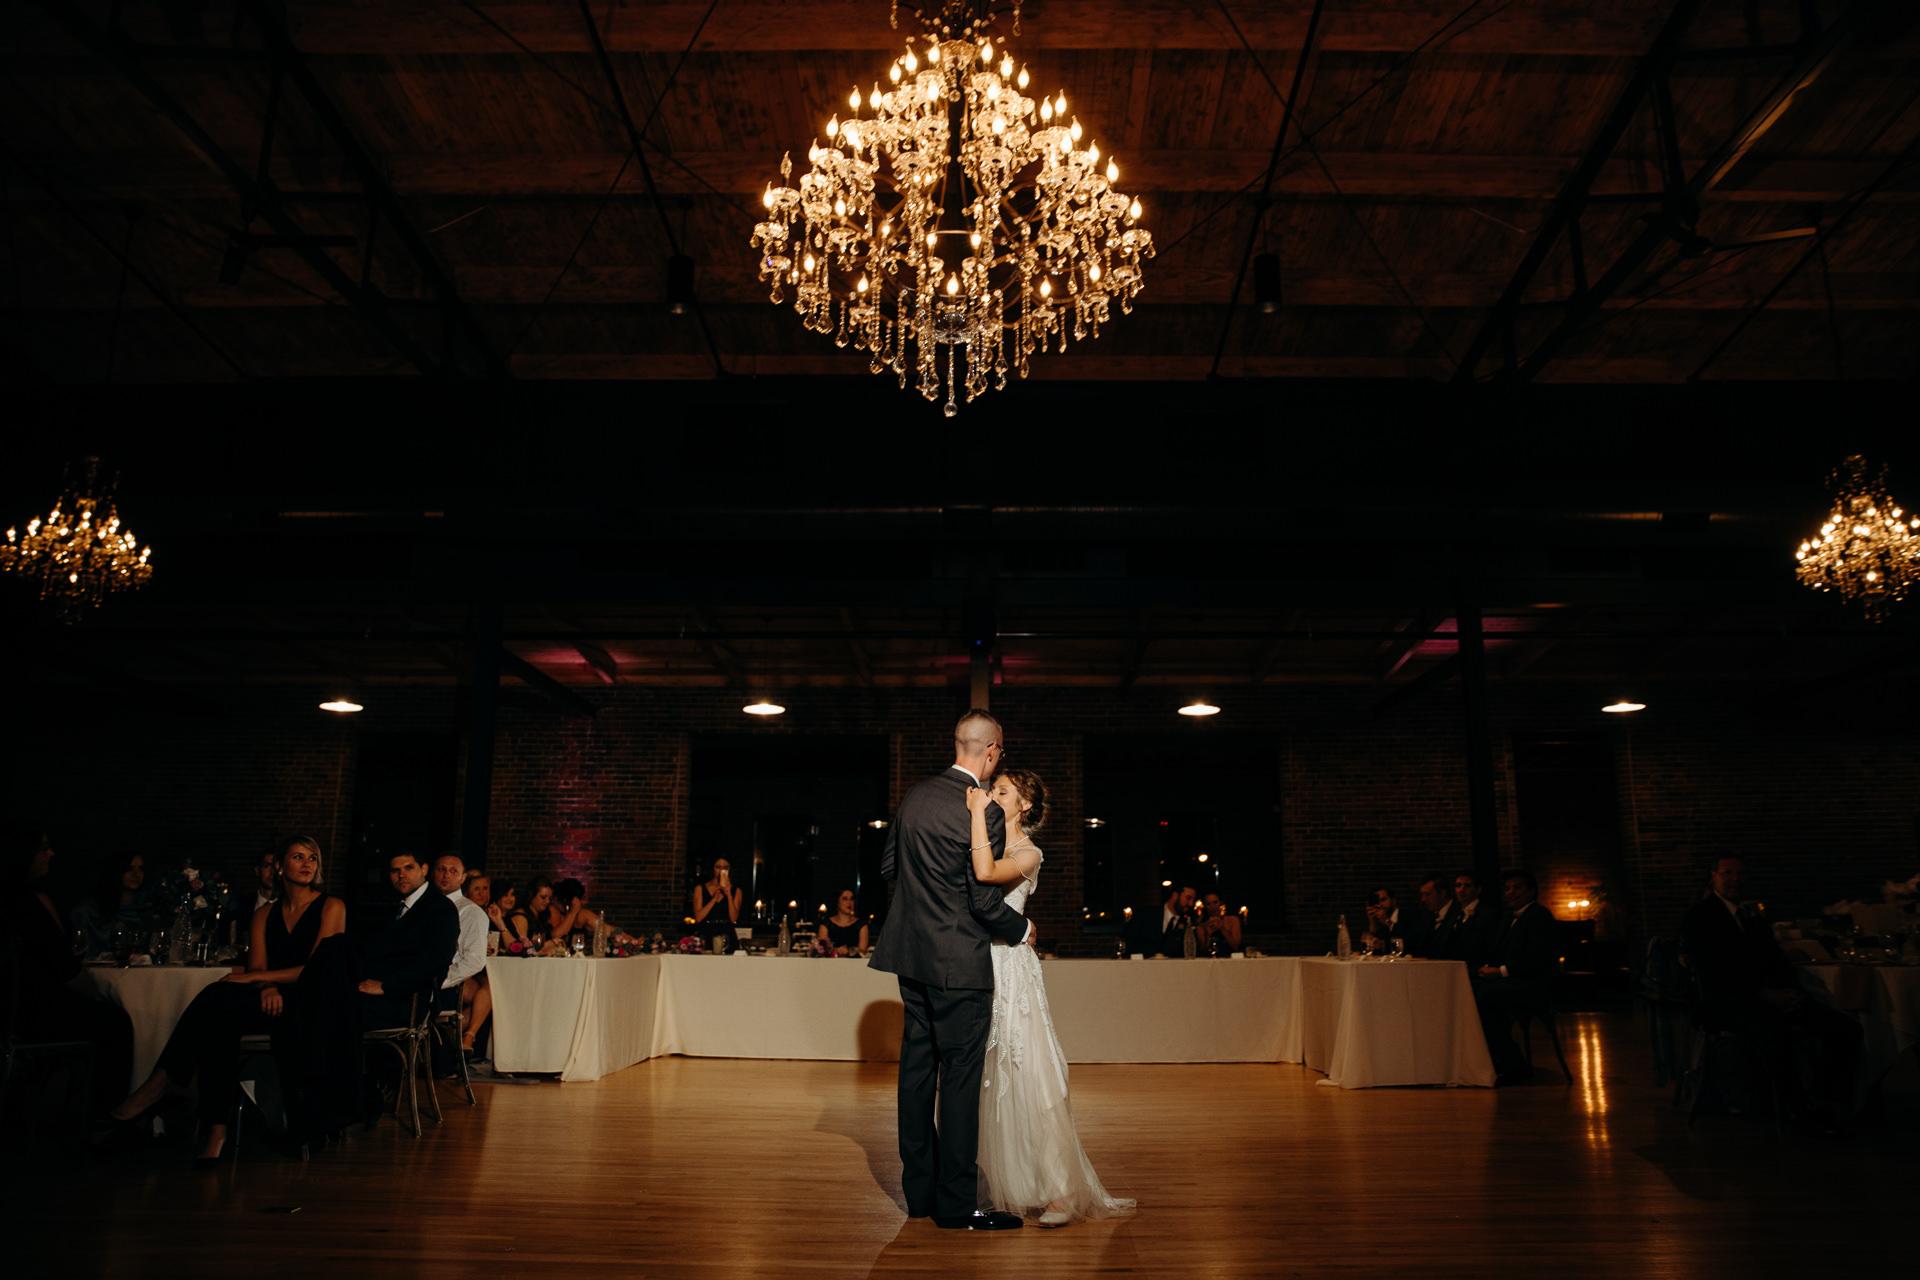 Armory wedding south bend grant beachy photography elkhart goshen -068.jpg